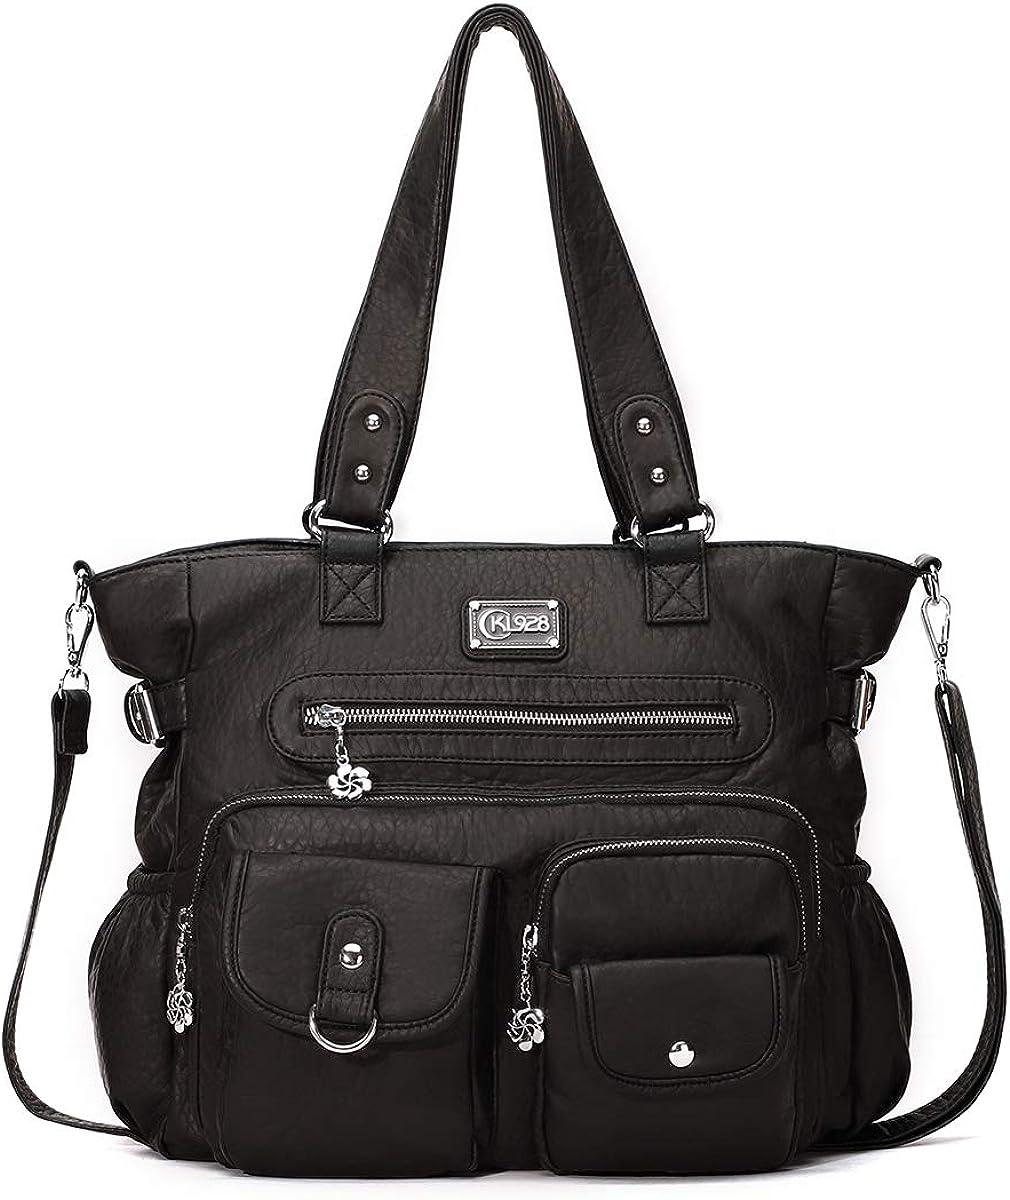 KL928 Large Purses for Women Superlatite Shoulder Crossbody Max 64% OFF Handbags H